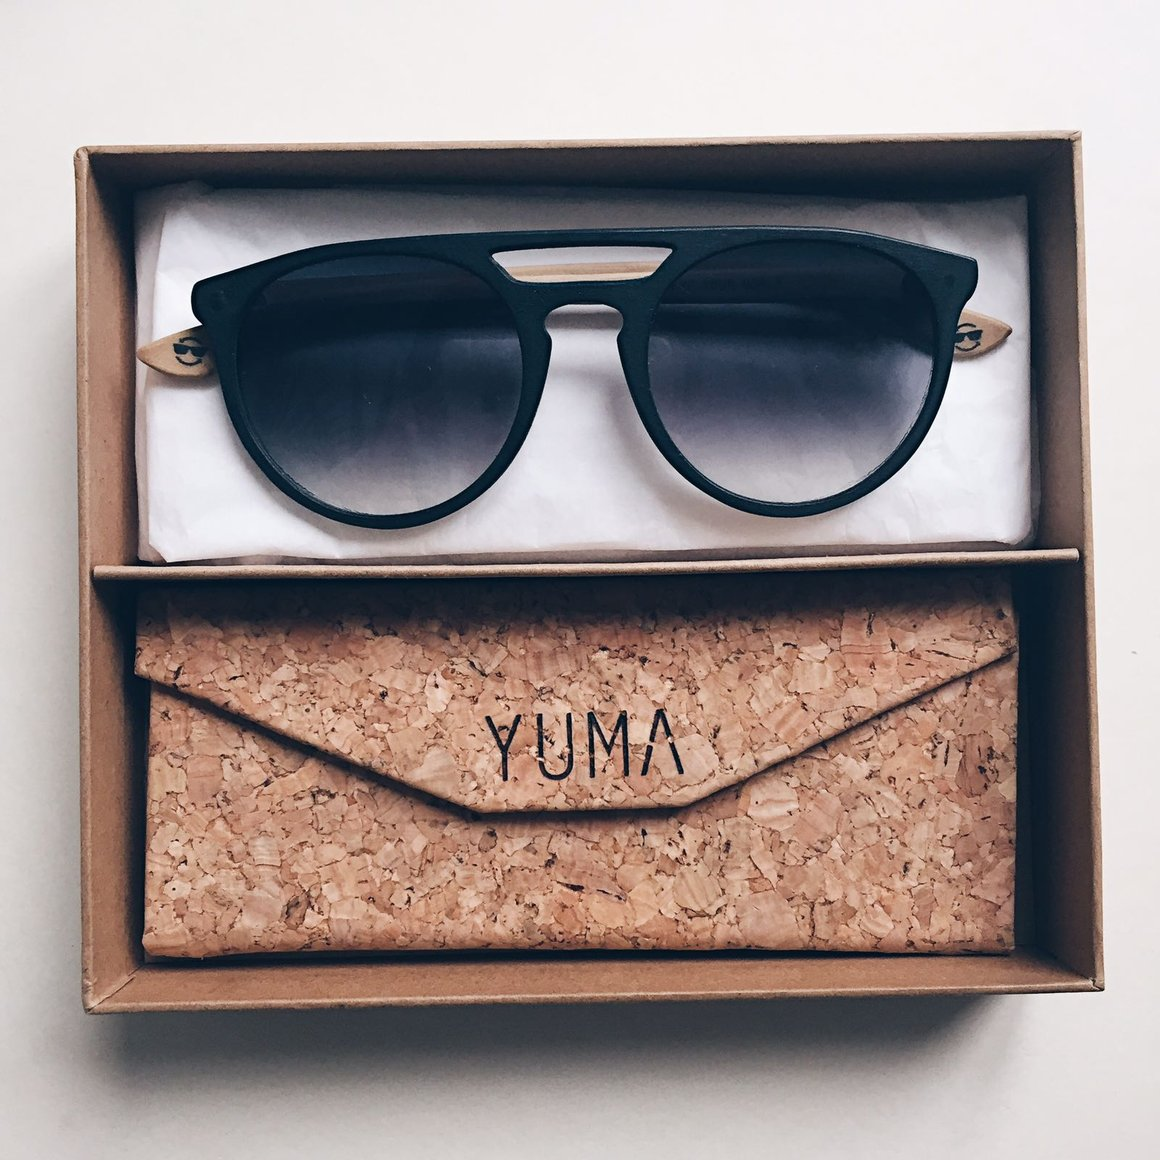 w.r.yuma sunglasses.jpeg